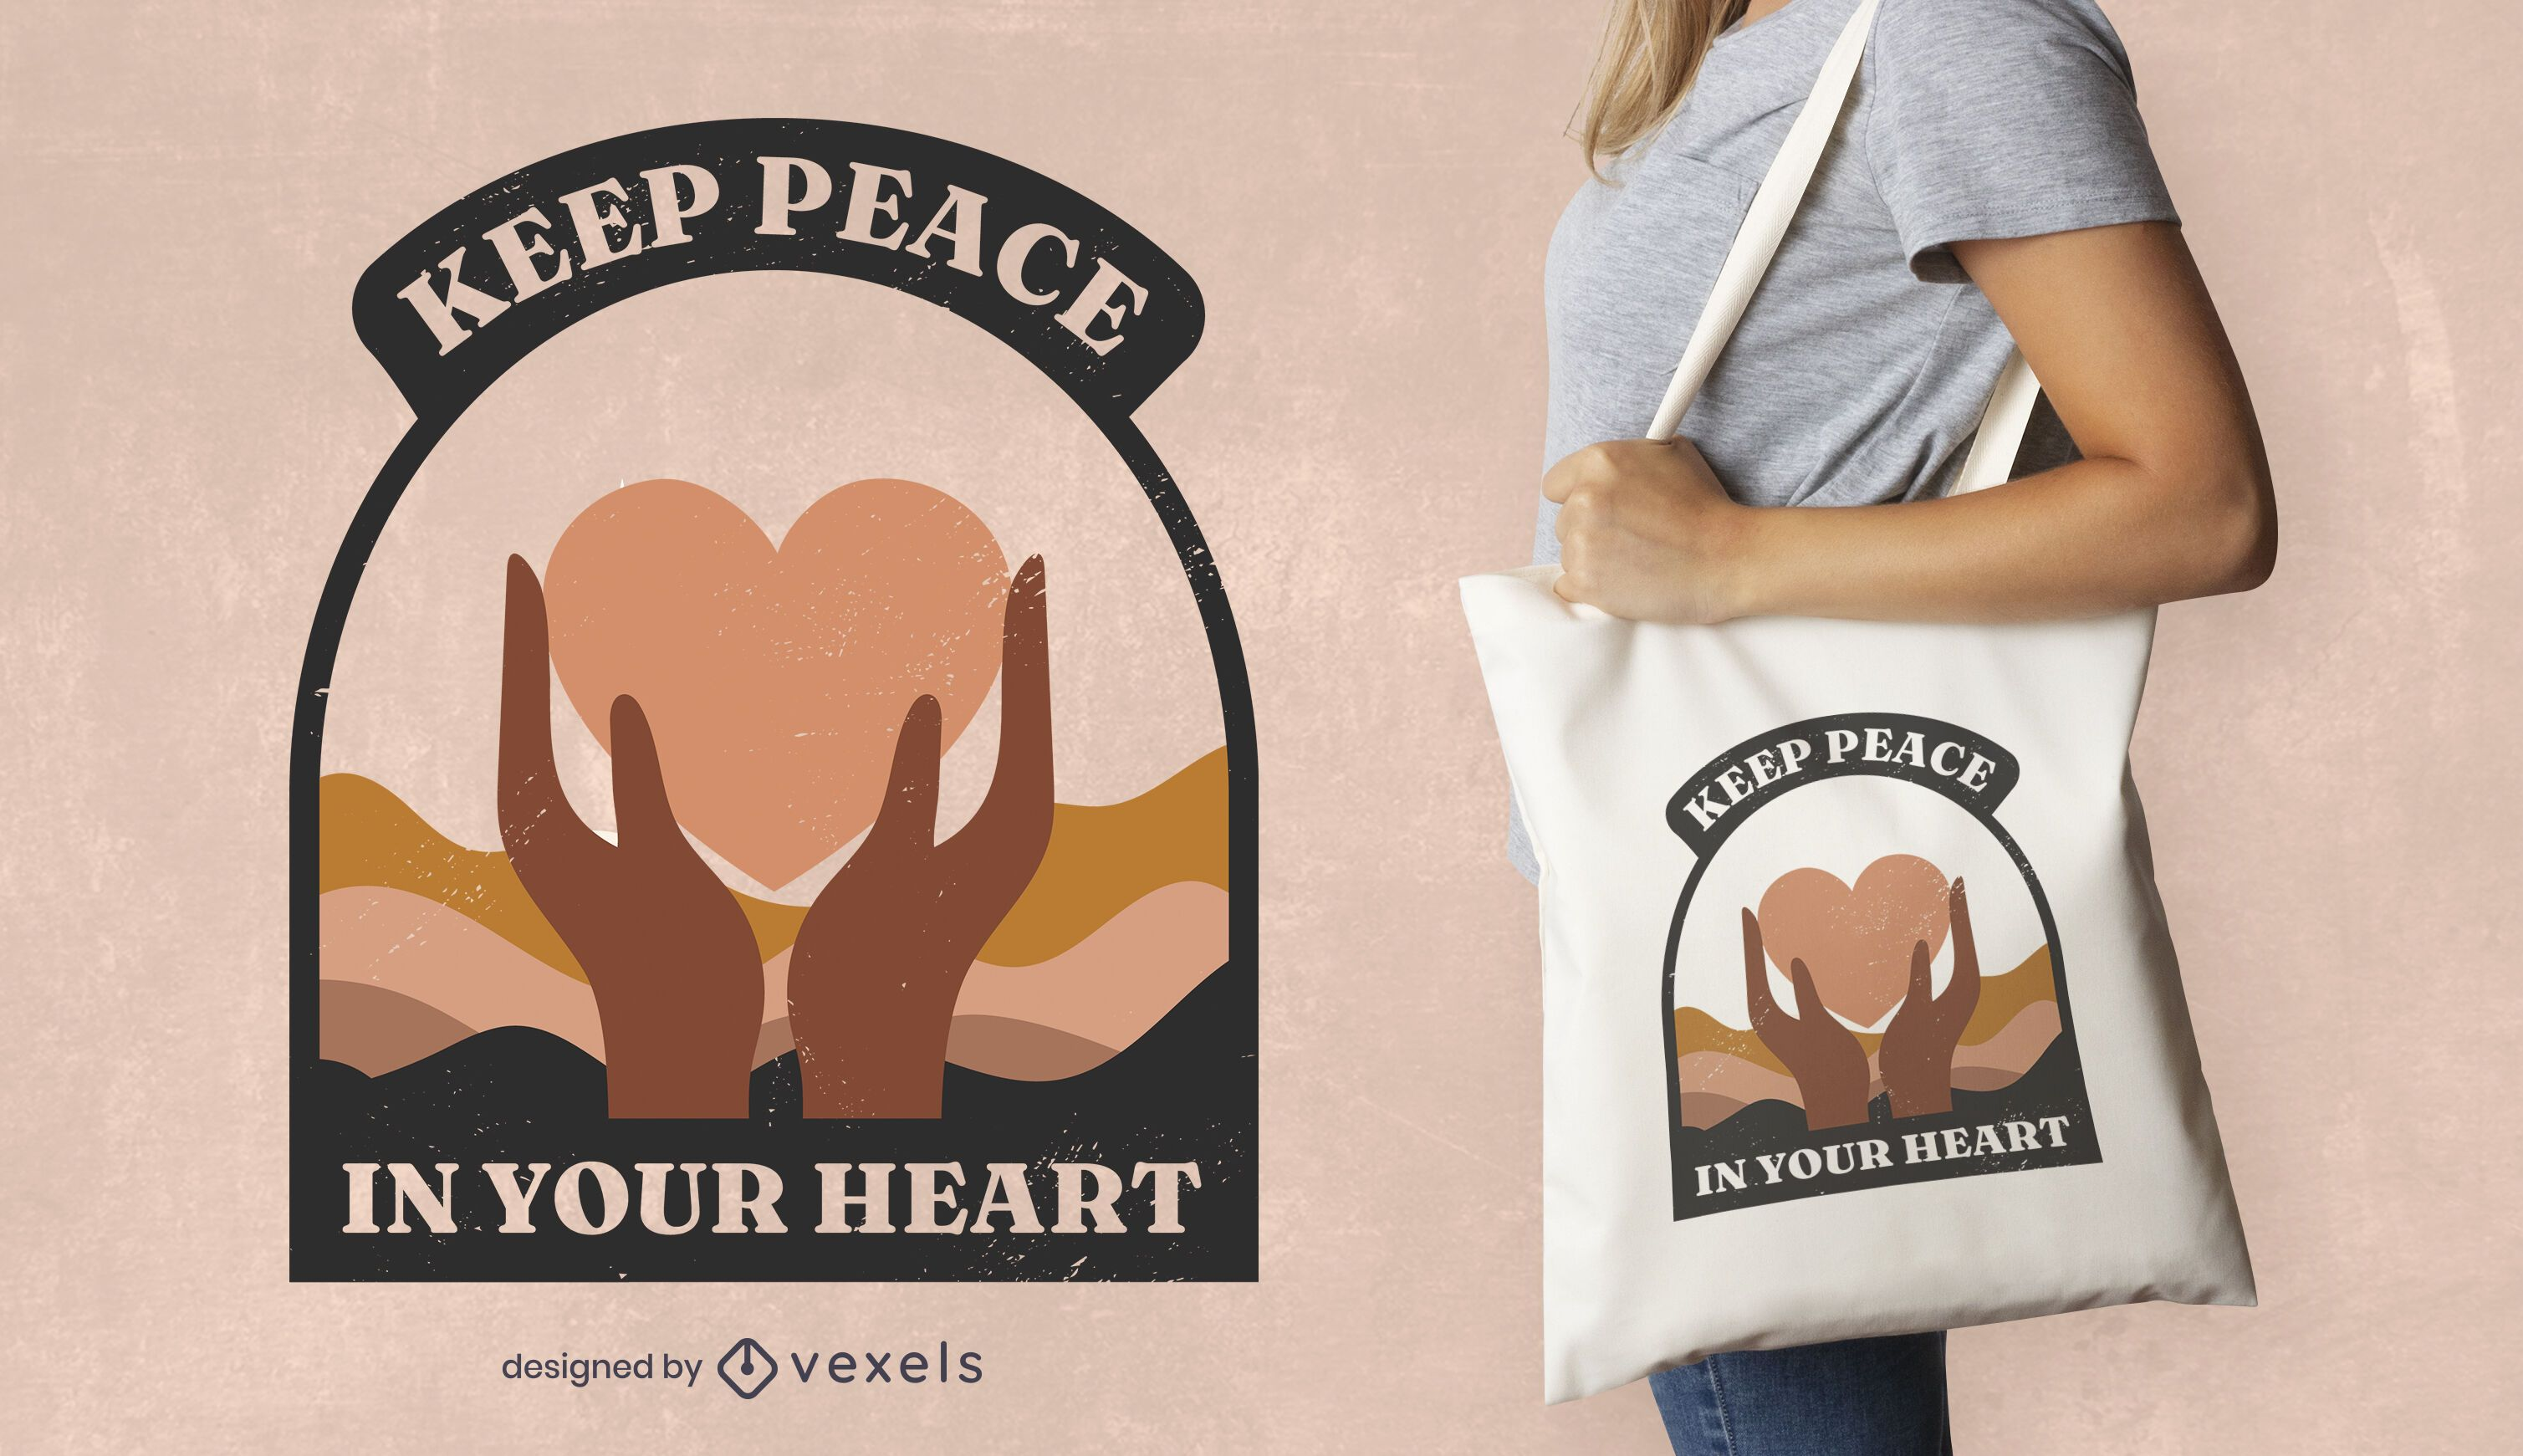 Peace day heart quote tote bag design